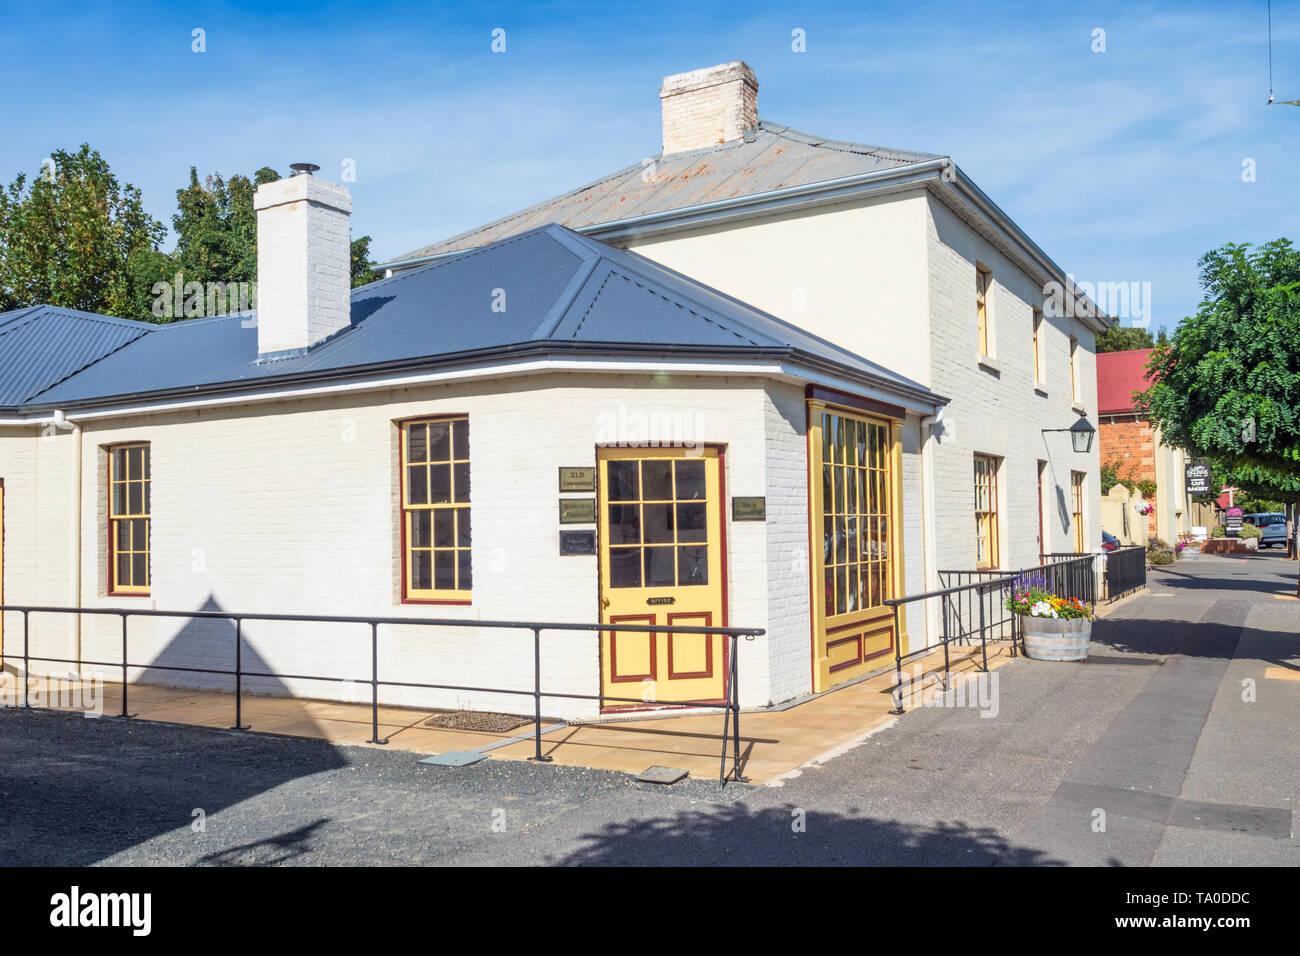 TASMANIA, AUSTRALIA - MARCH 4, 2019: Old buildings in Russell Street, in the historic town of Evandale in Tasmania, Australia. Stock Photo